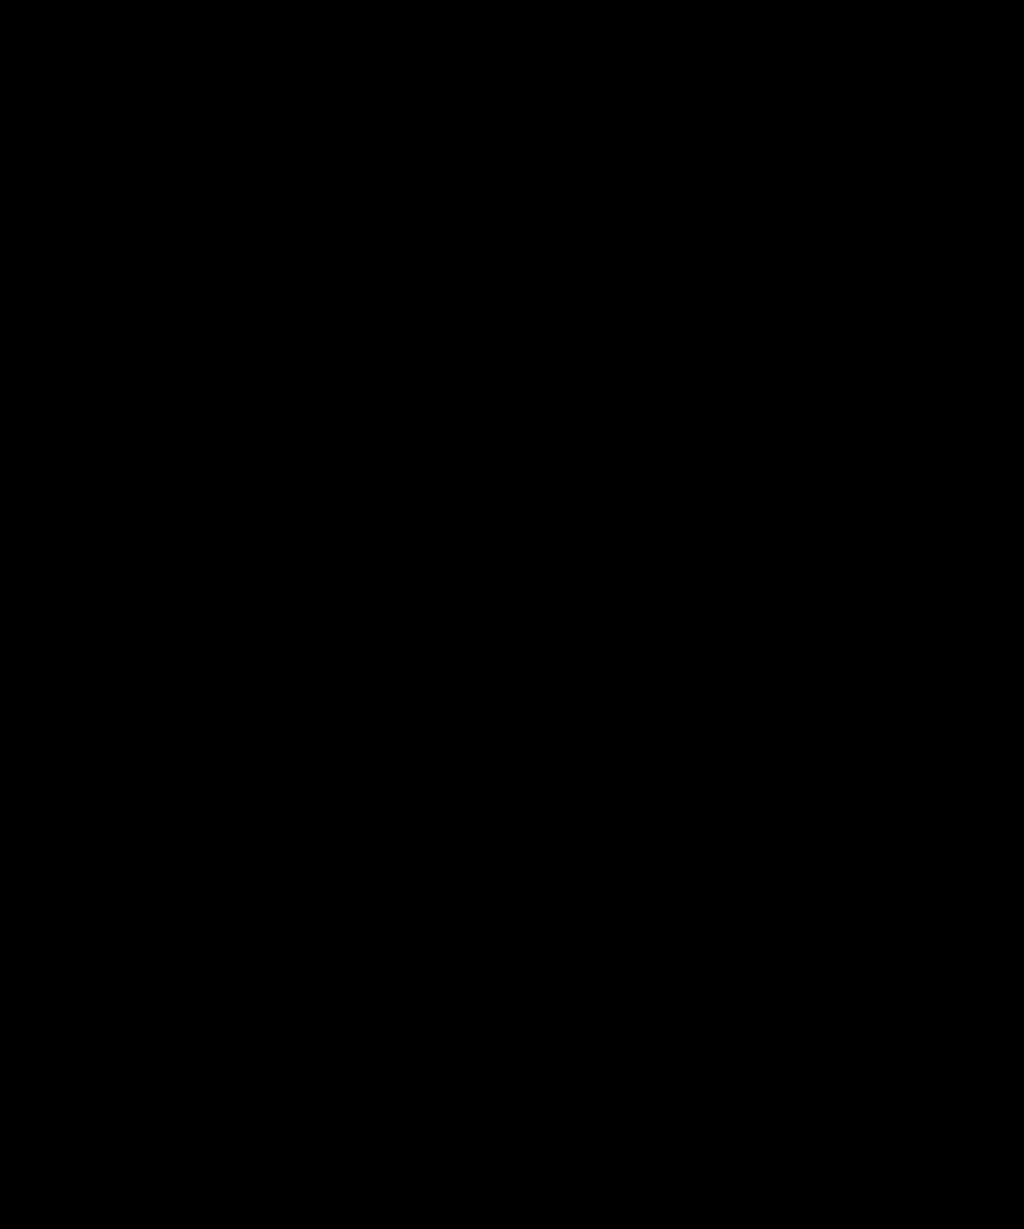 Coloring Lineart : Mettaton chibi lineart by sciencepanda on deviantart